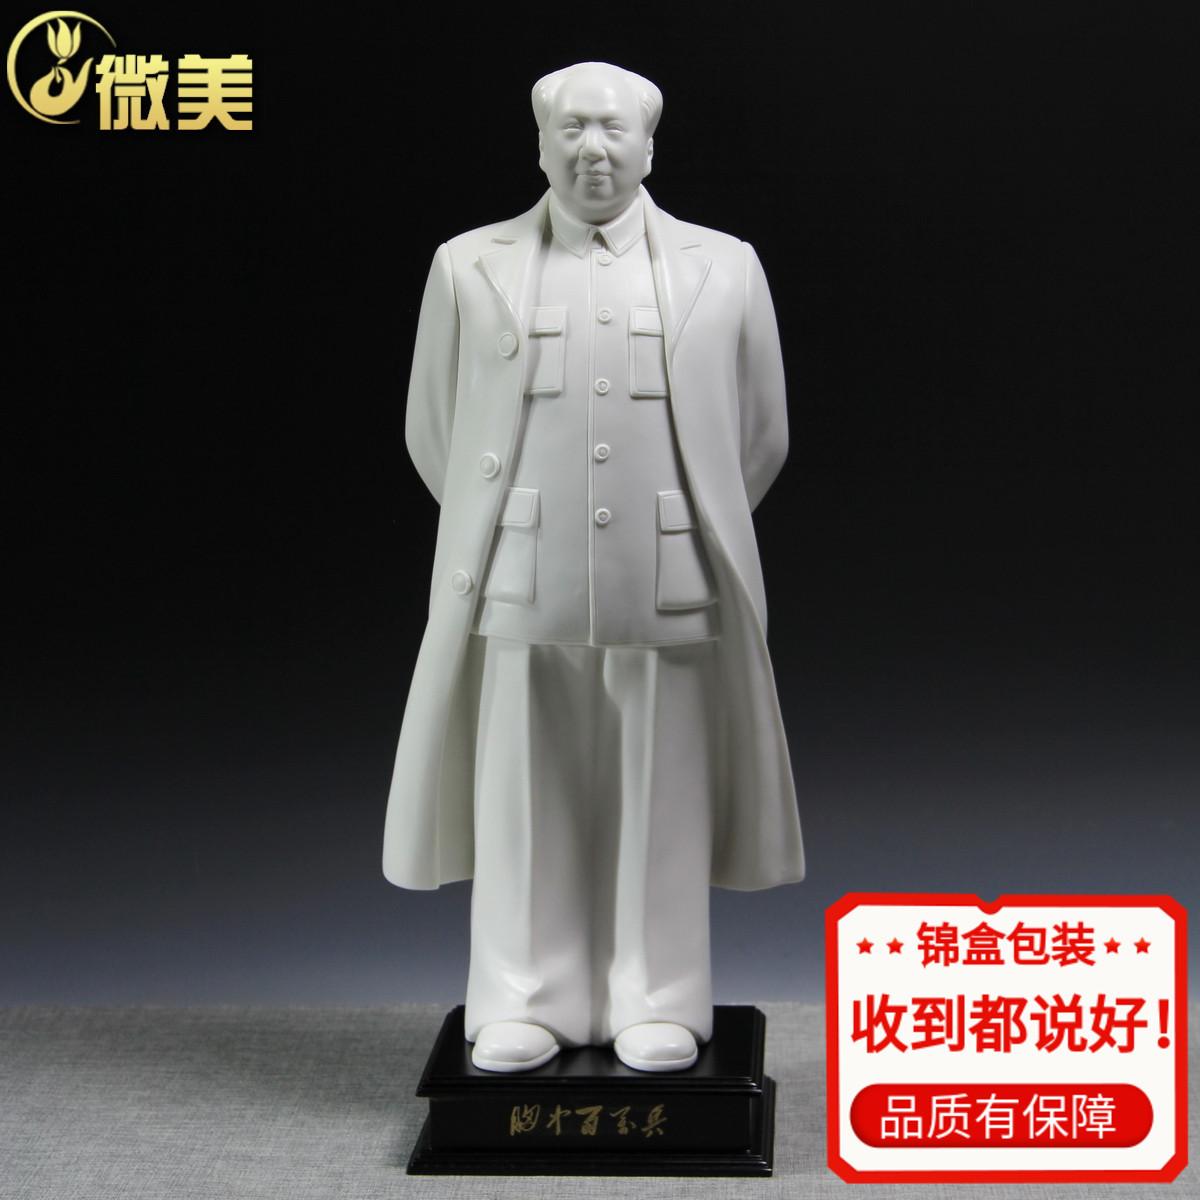 Коллекции китайской партии Артикул 651434142146